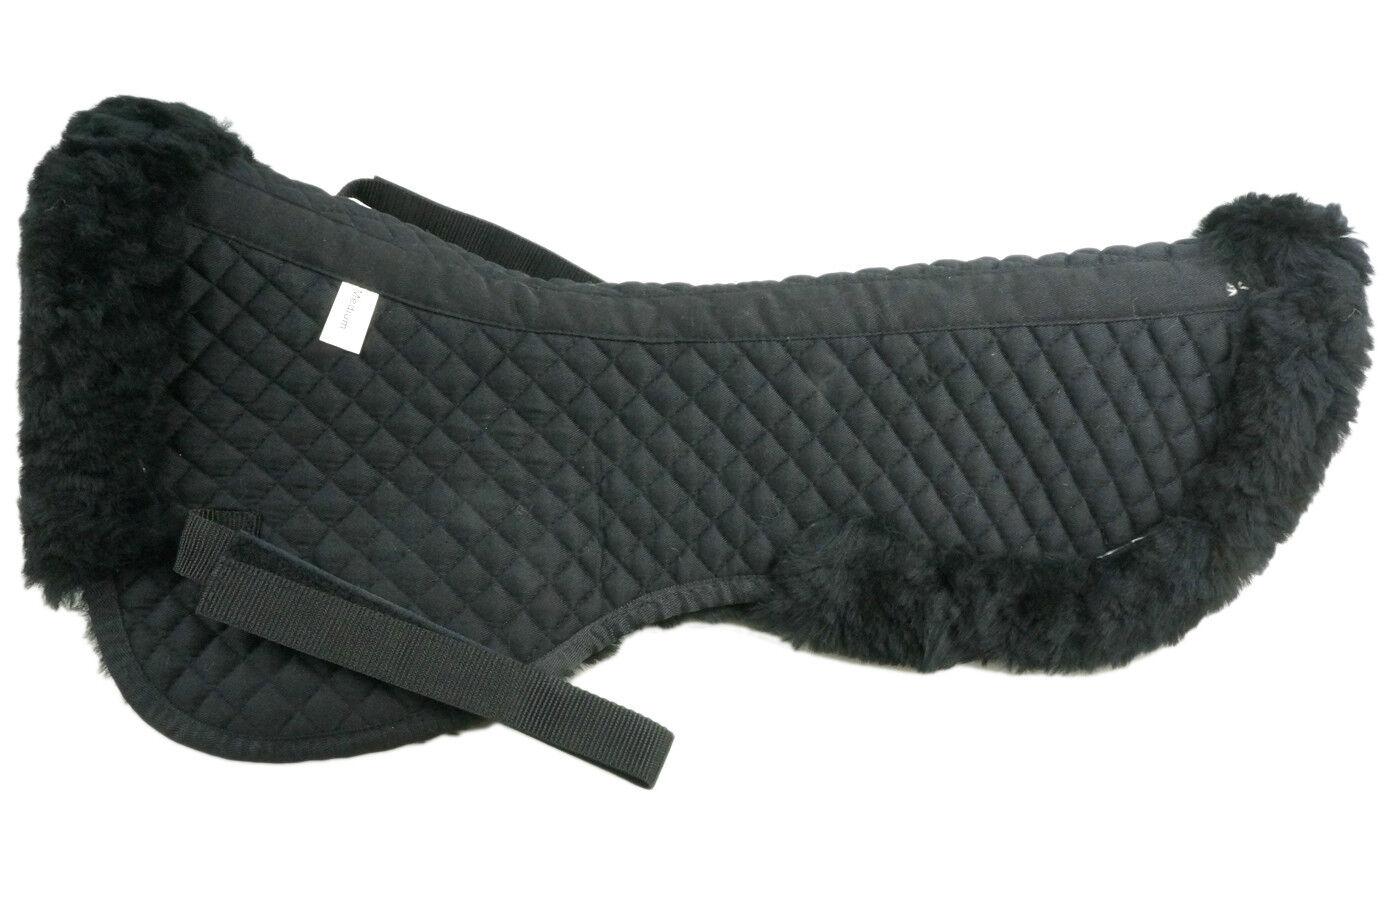 Genuine Merino Classical Superb Sheepskin half Saddle  Pad for pony size  in stock